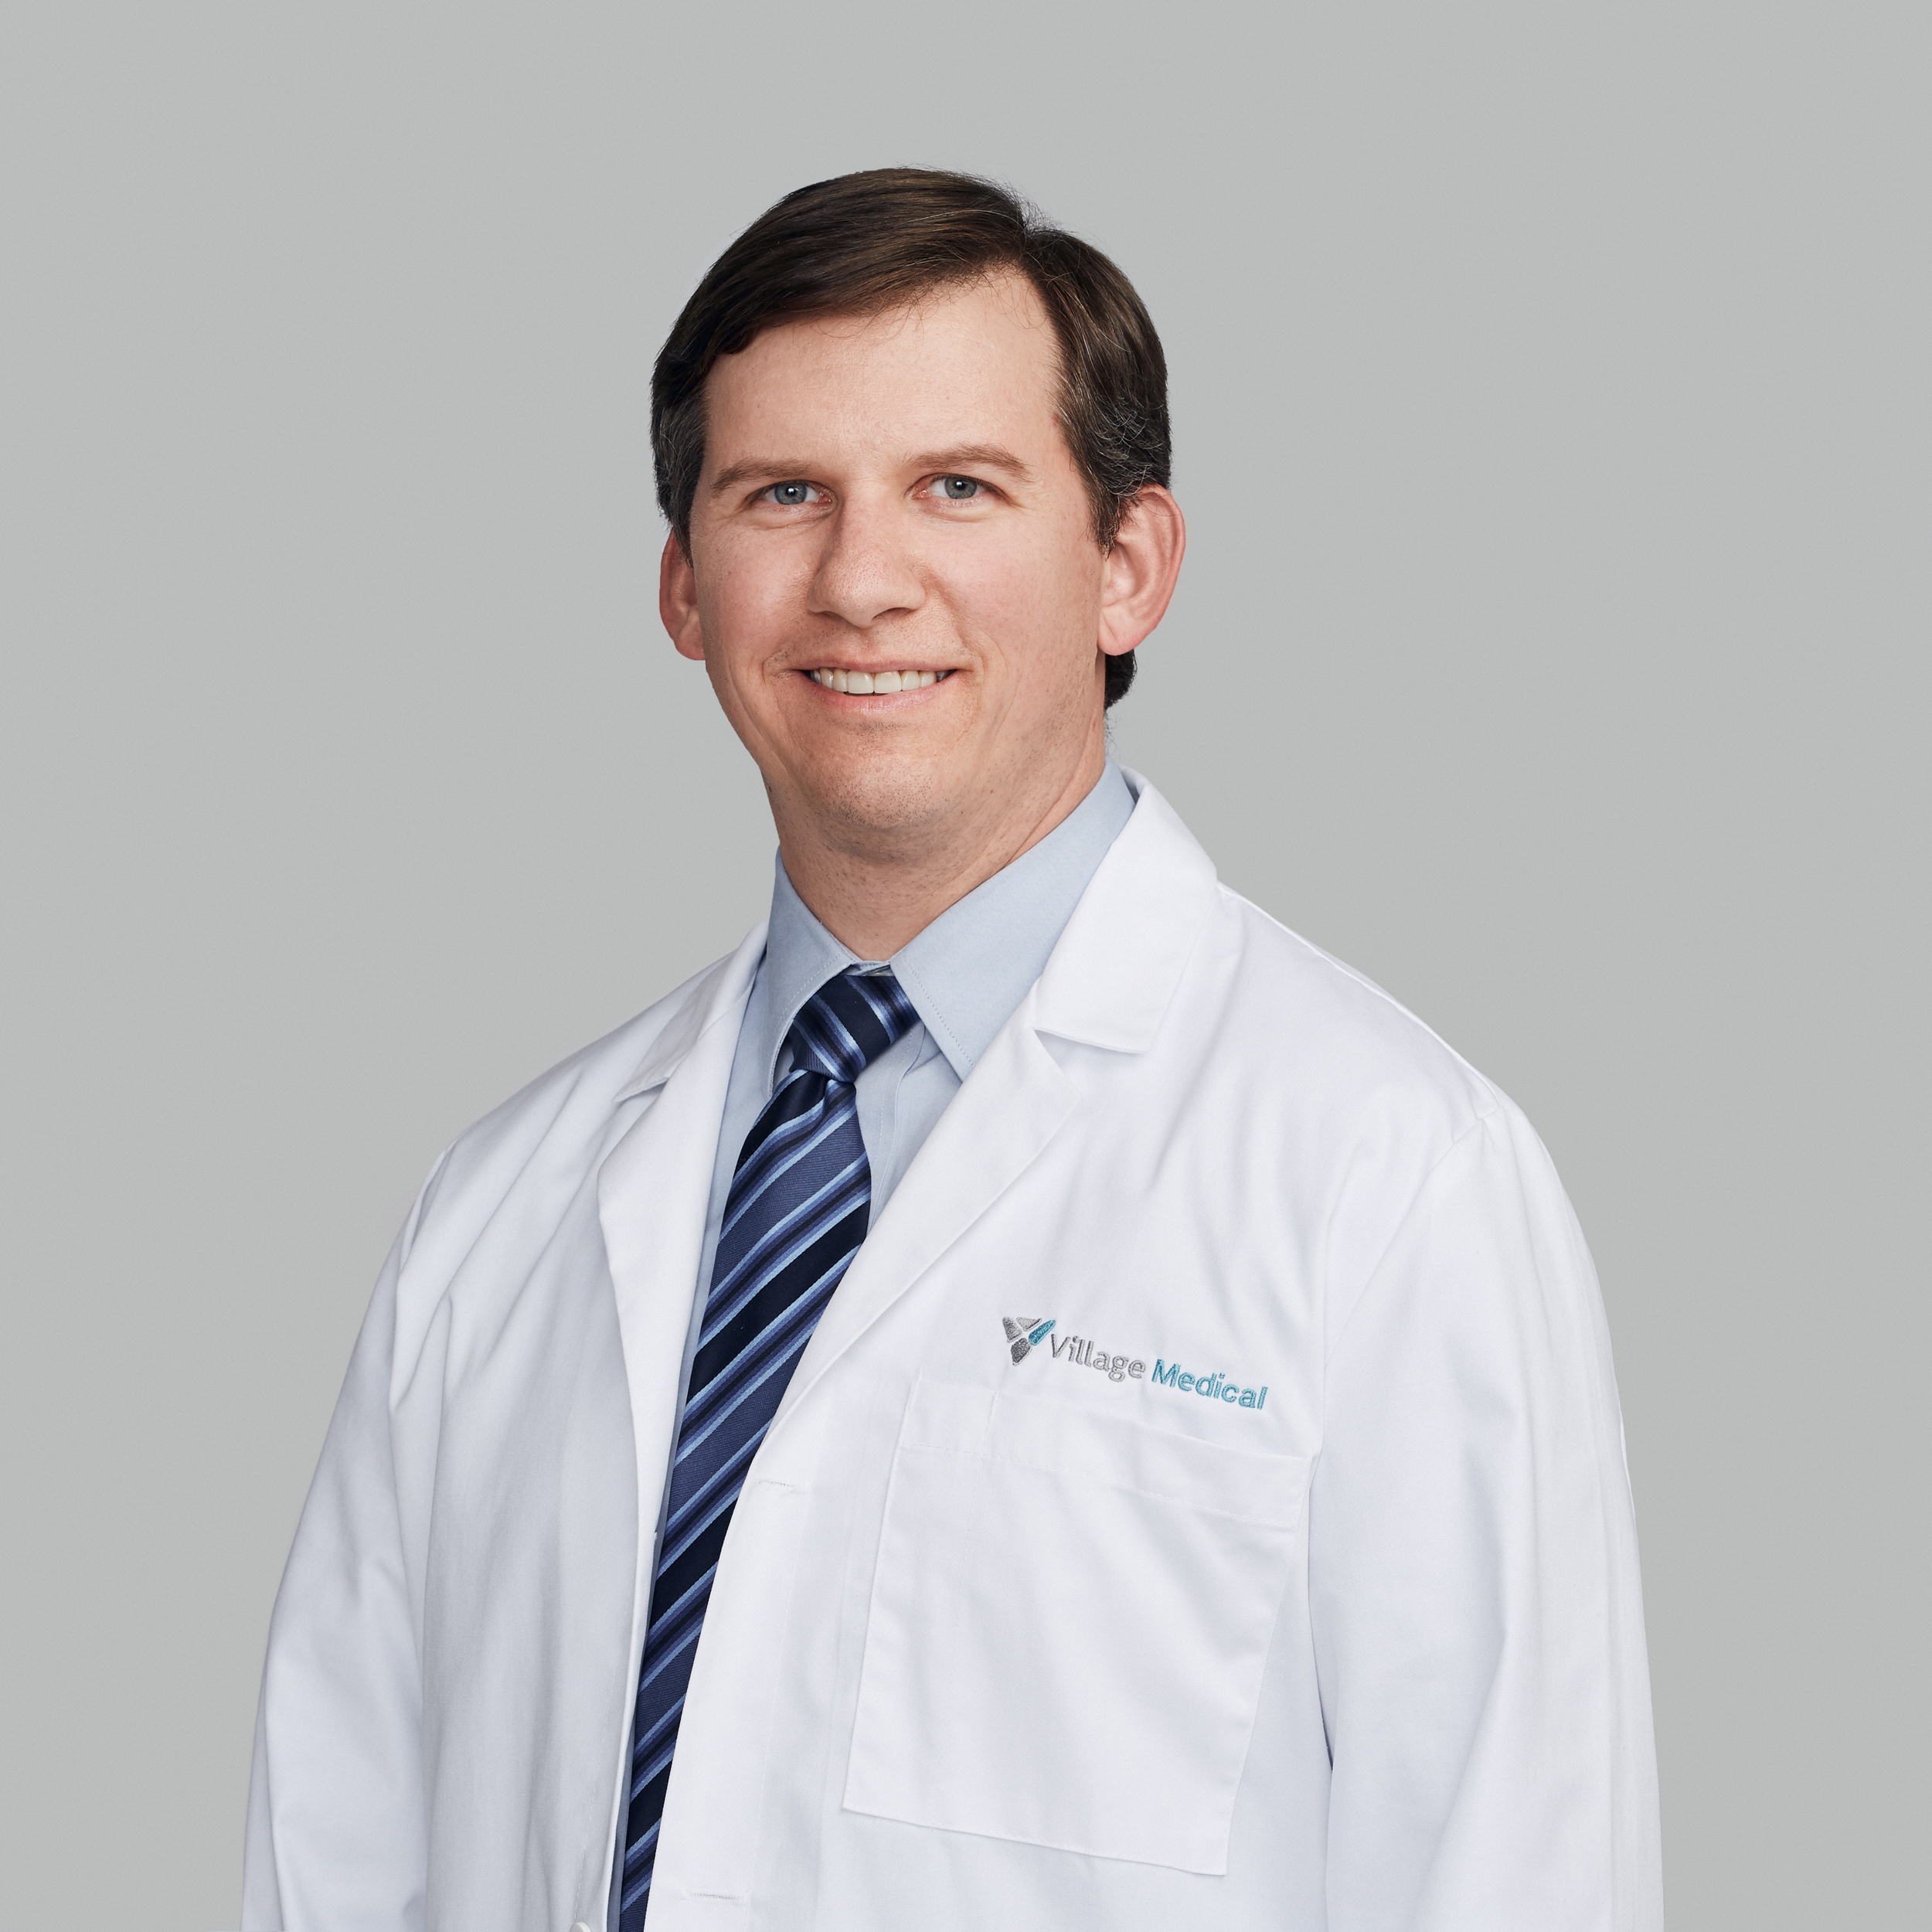 Robert Swierupski, MD